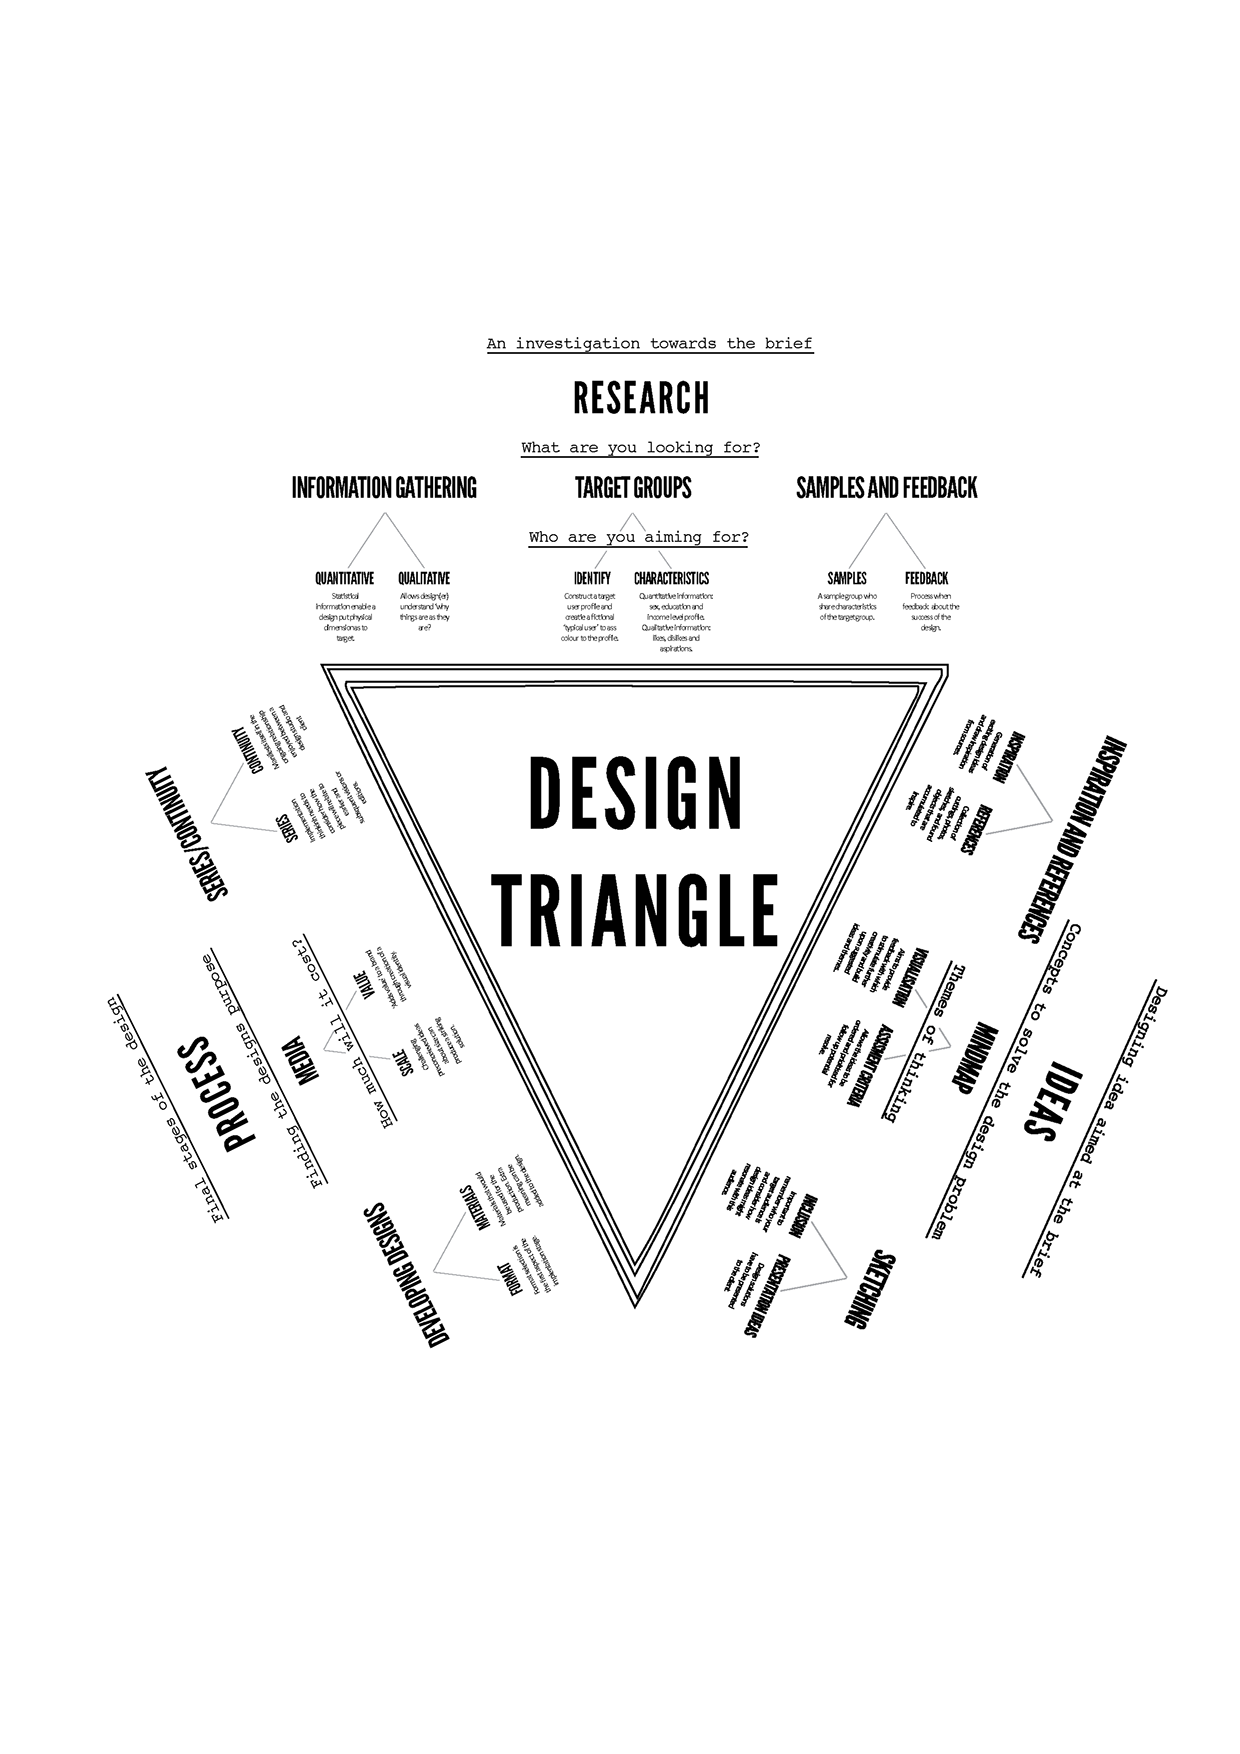 Design Thinking The Design Triangle